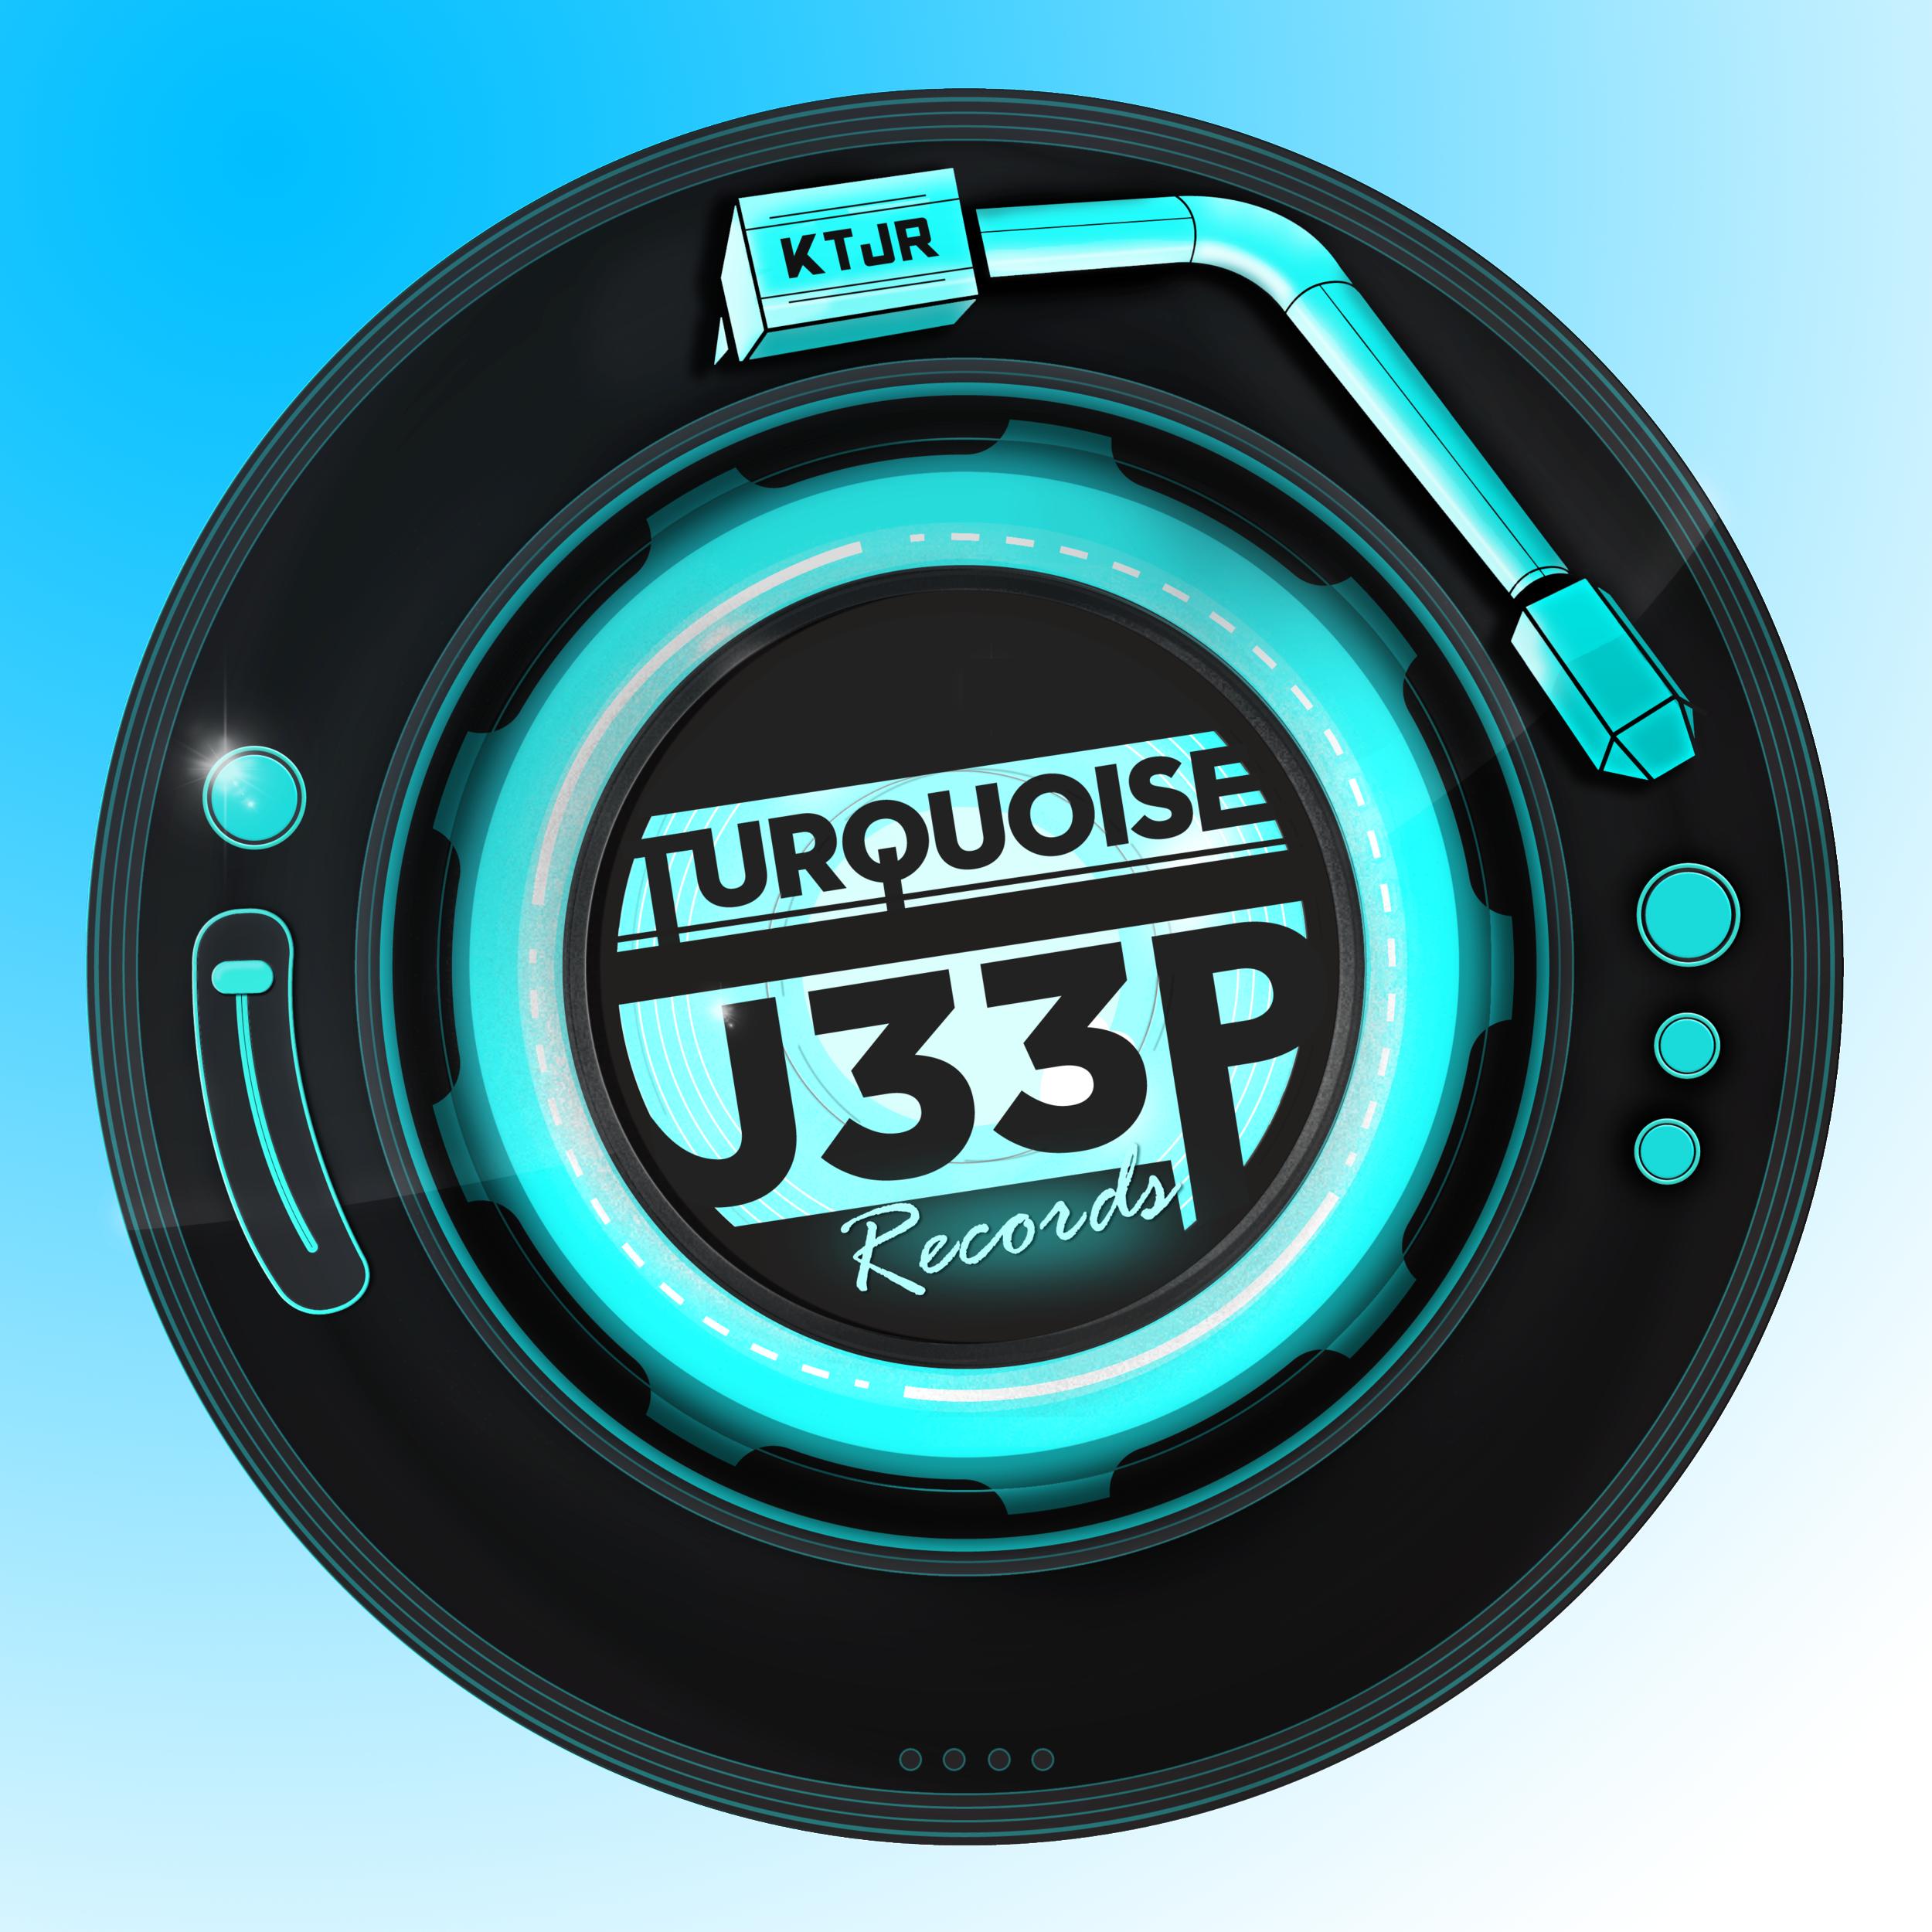 Turquoise J33P Records